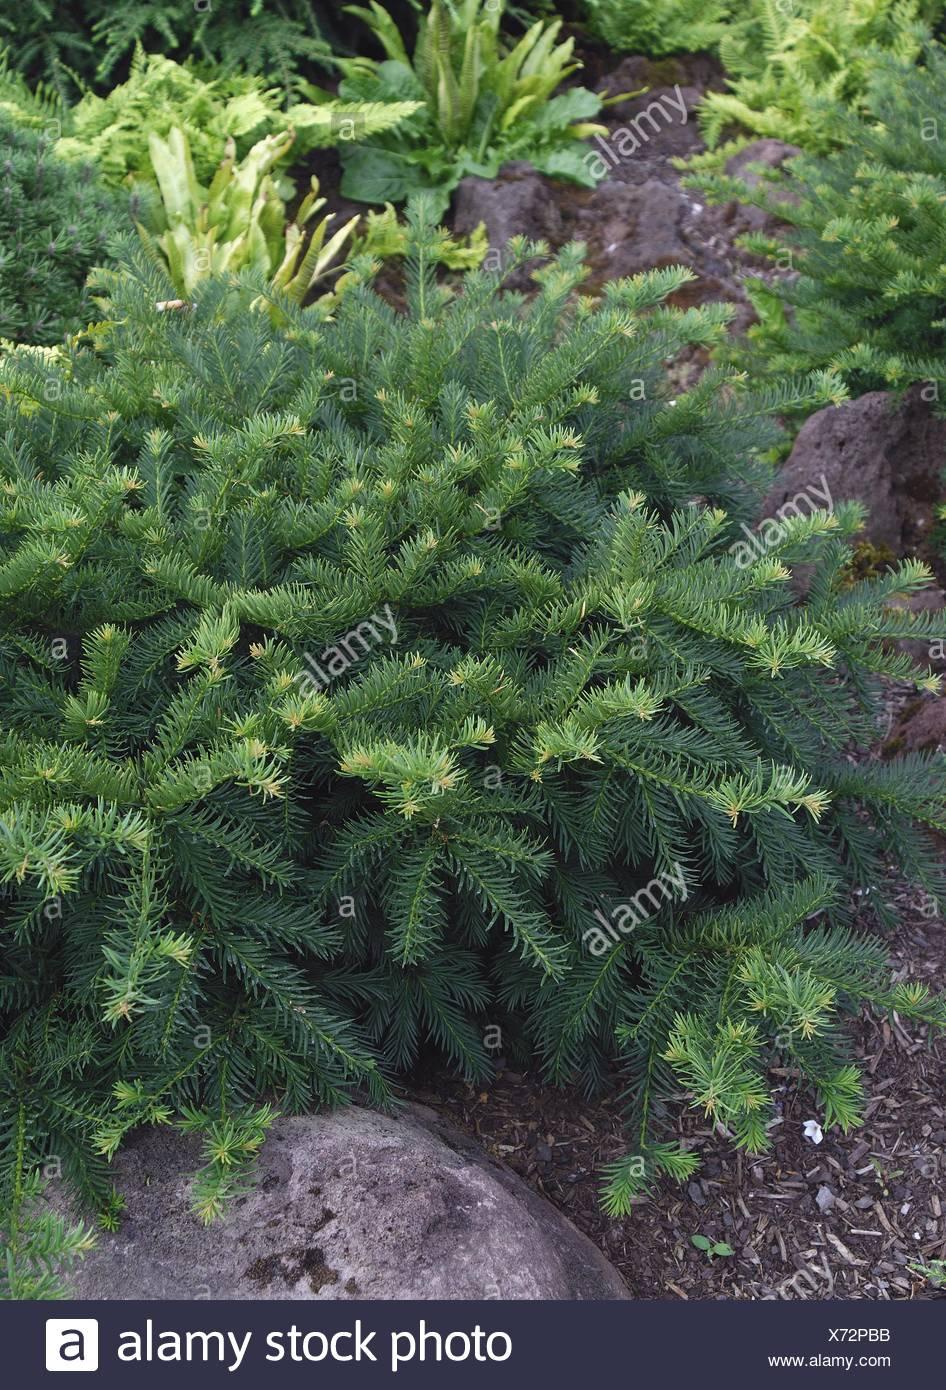 common yew (Taxus baccata 'Repandens', Taxus baccata Repandens), cultivar Repandes Stock Photo